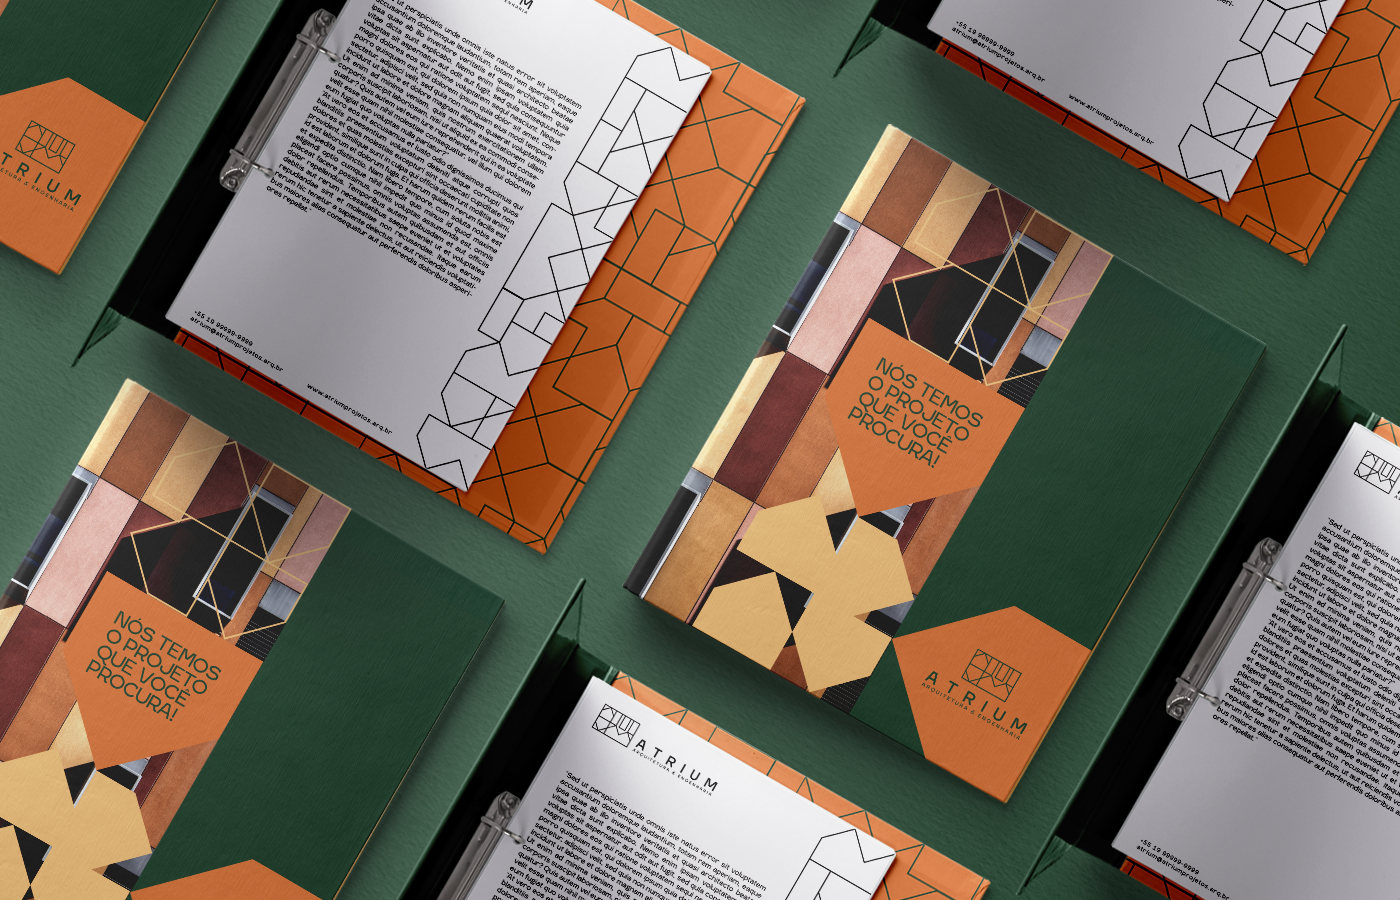 DSD Studio Atrium Arquitetura and Engenharia Brand Identity